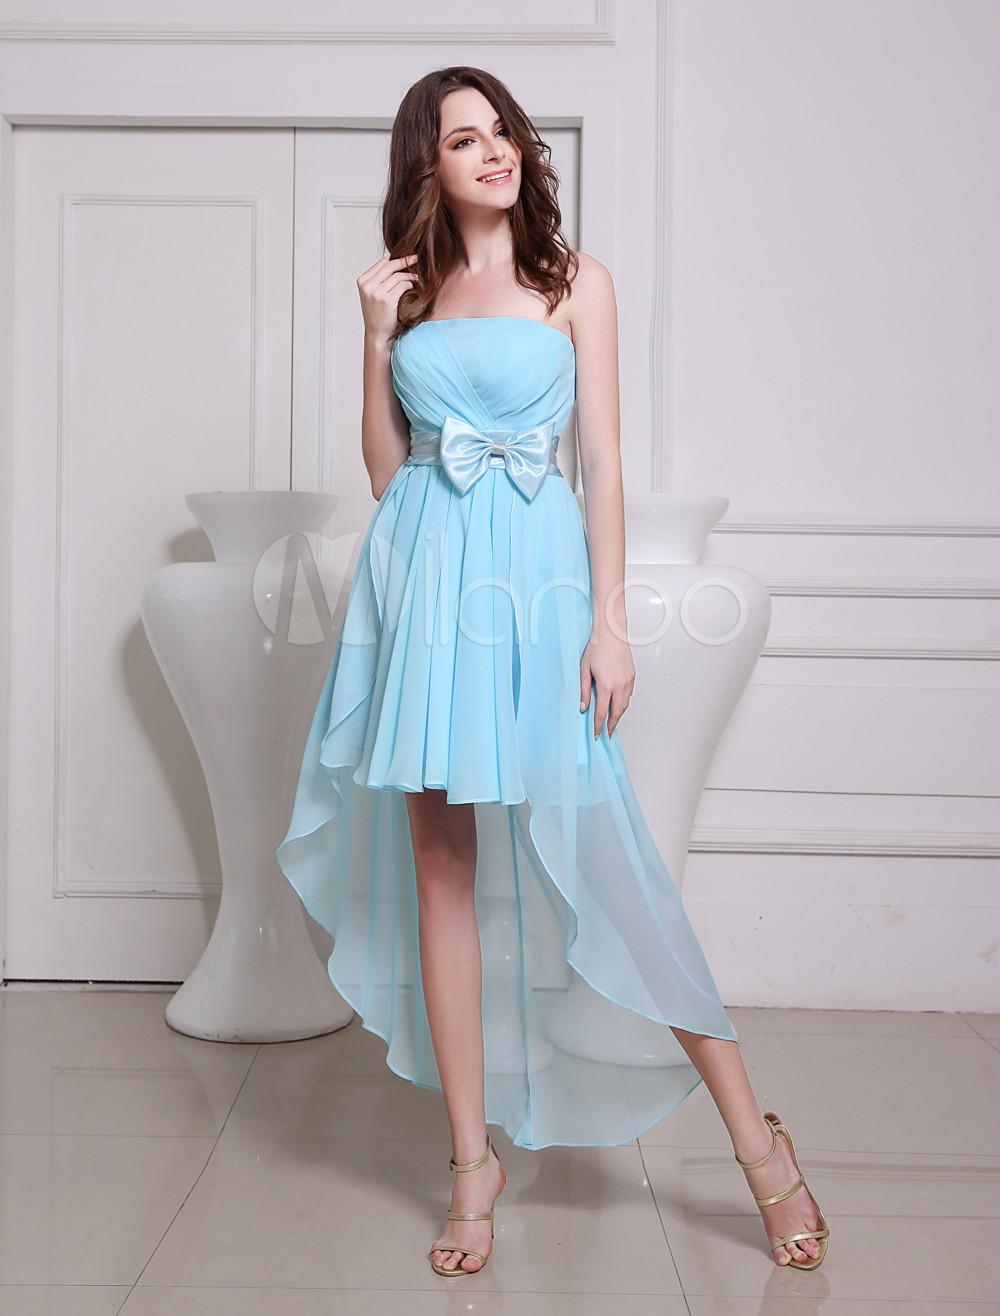 9bd97c8045c78 ウェディングドレス,二次会ドレス ライトブルー サッシュベルト リボン アシンメトリー